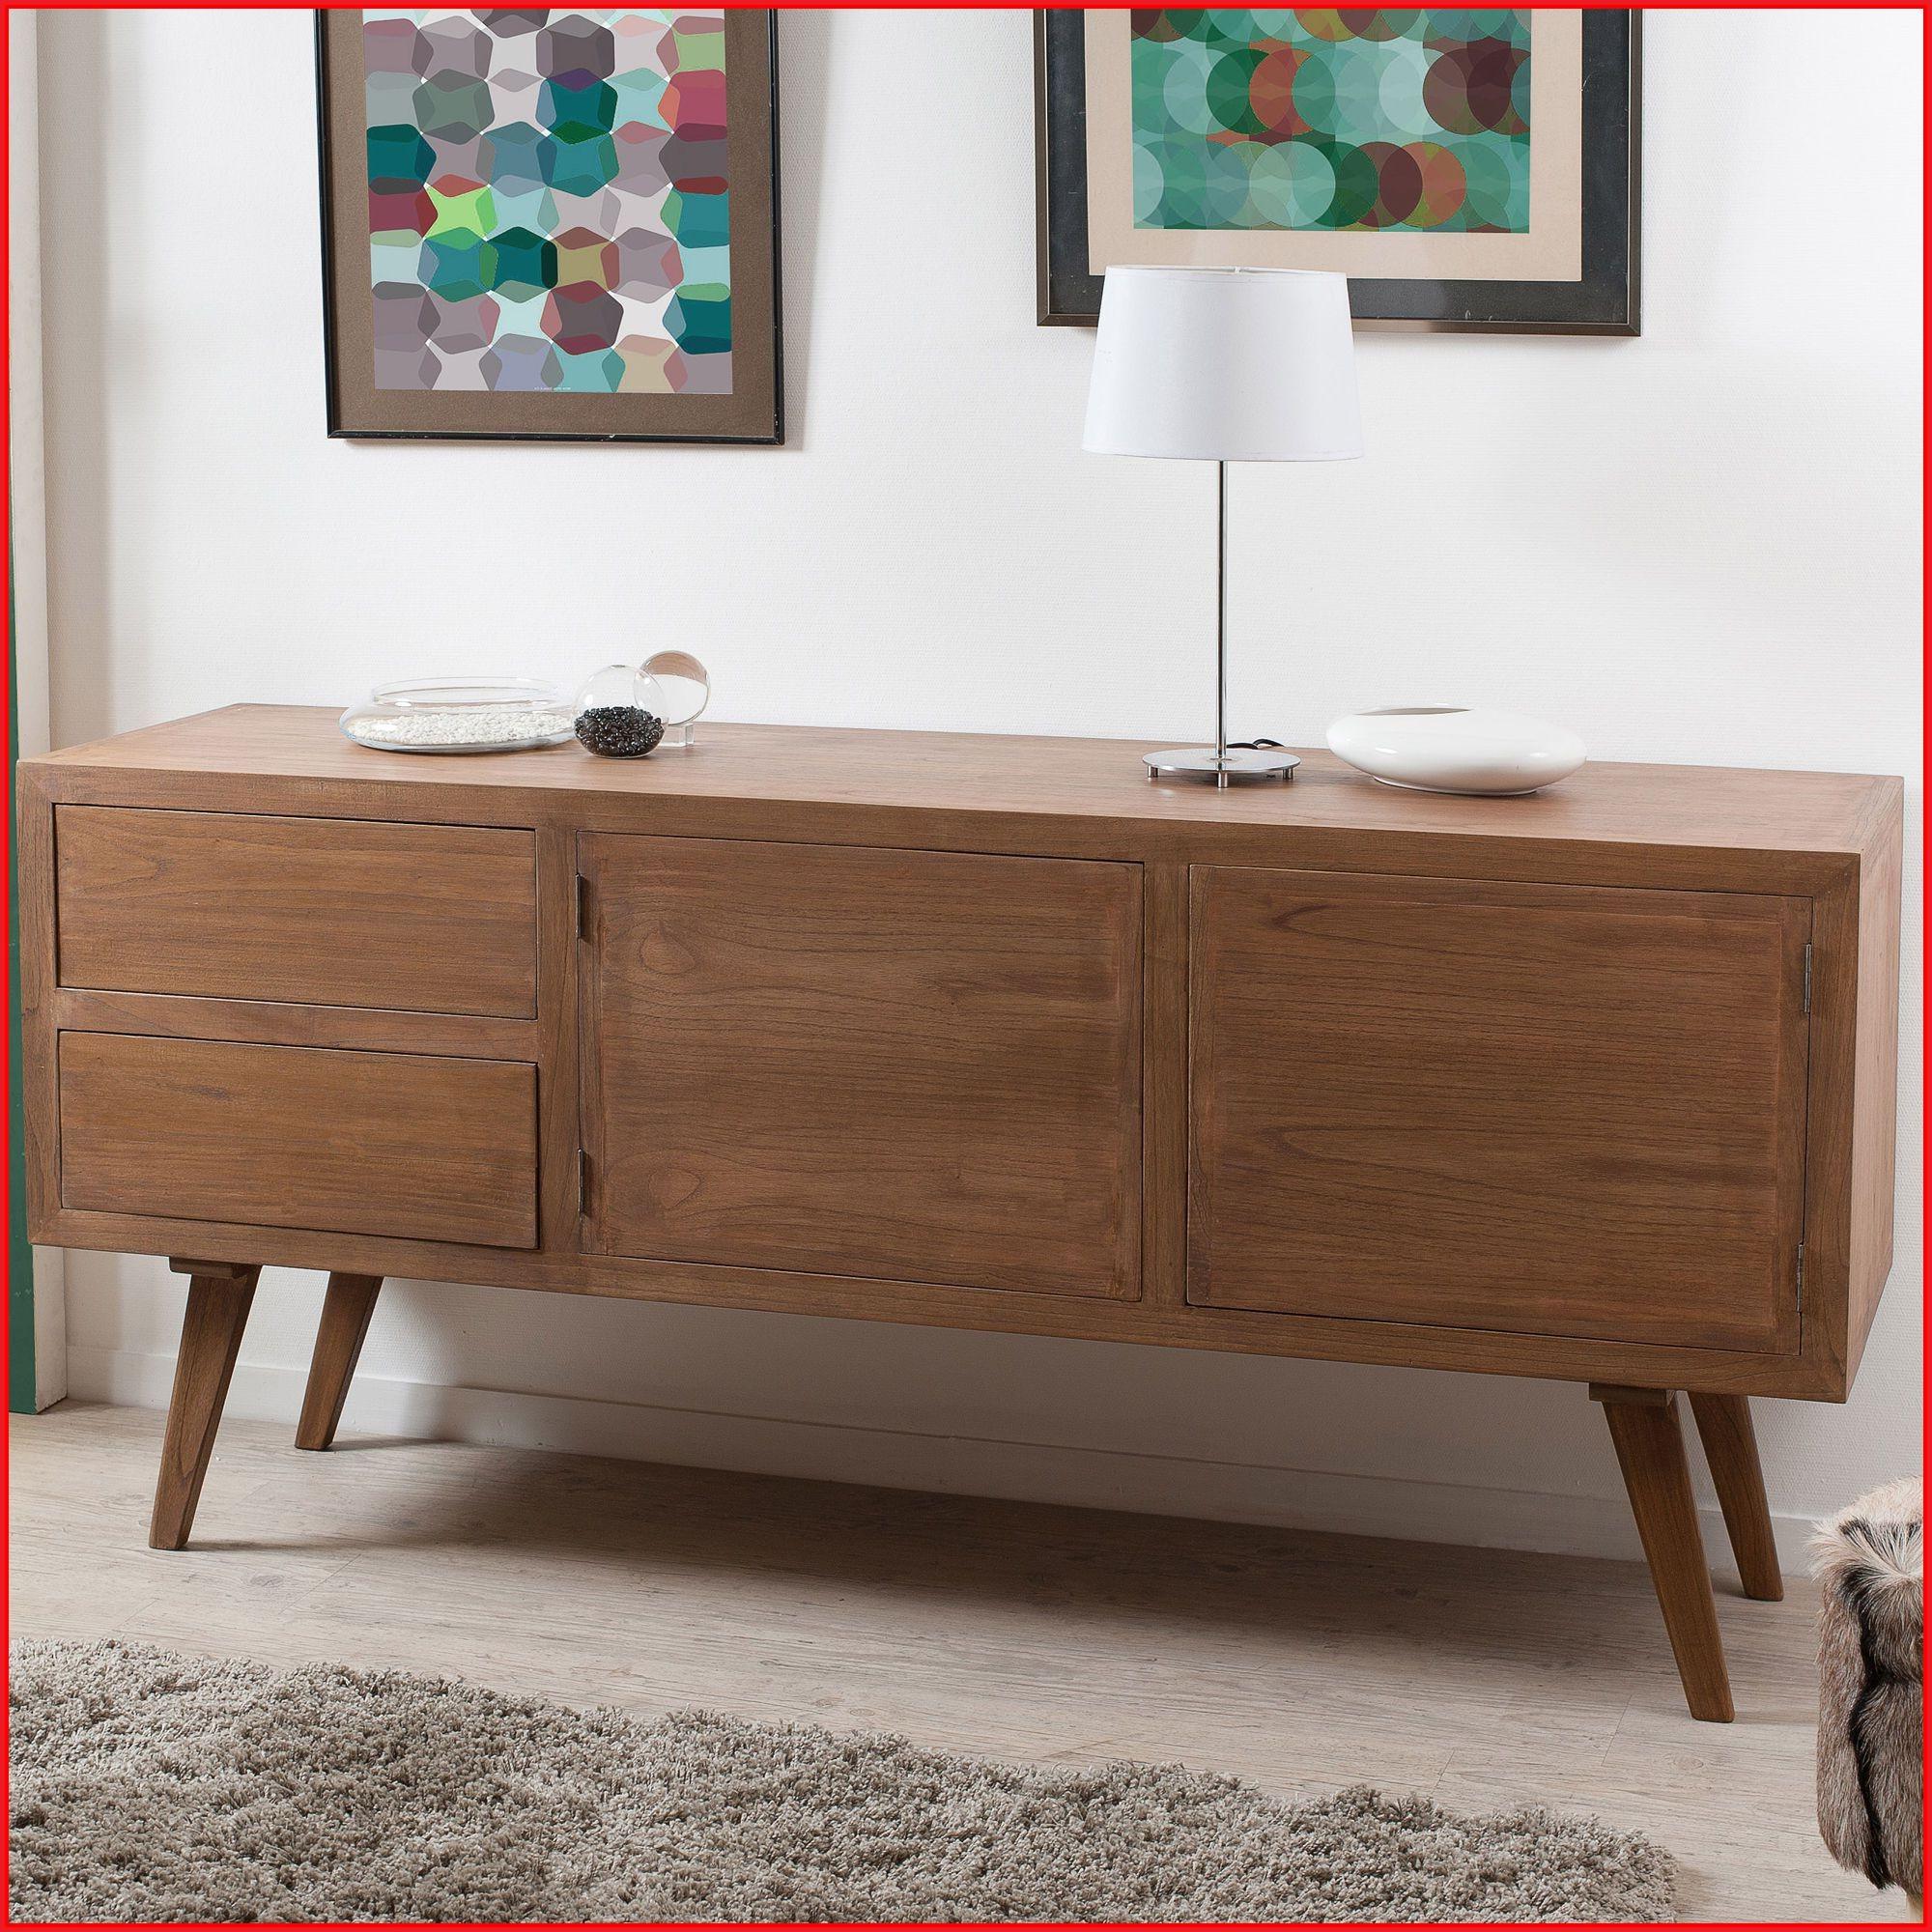 Muebles online rebajas best rebajas muebles mart nez d for Outlet de muebles online